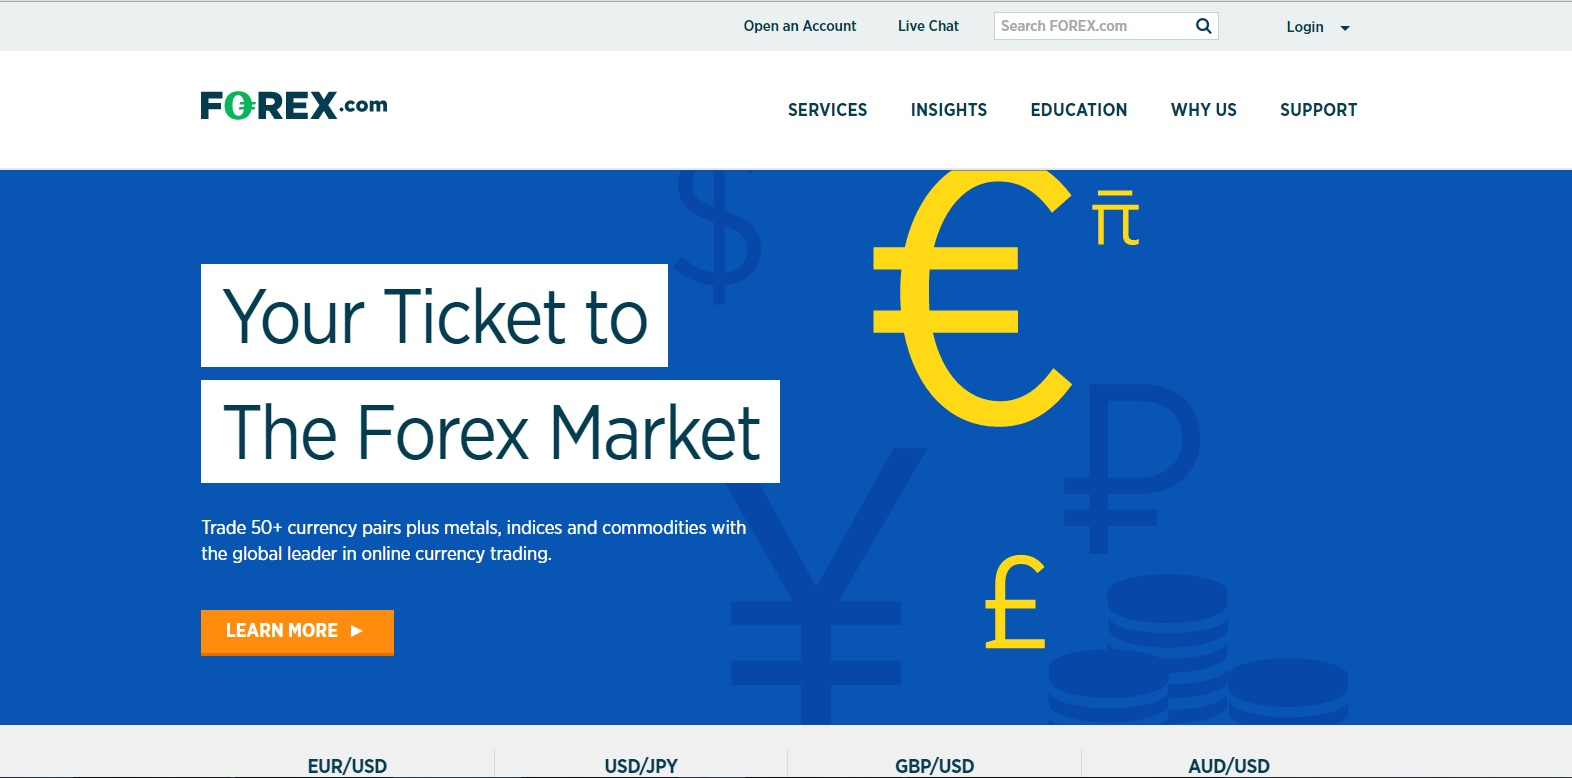 Forex com gain capital